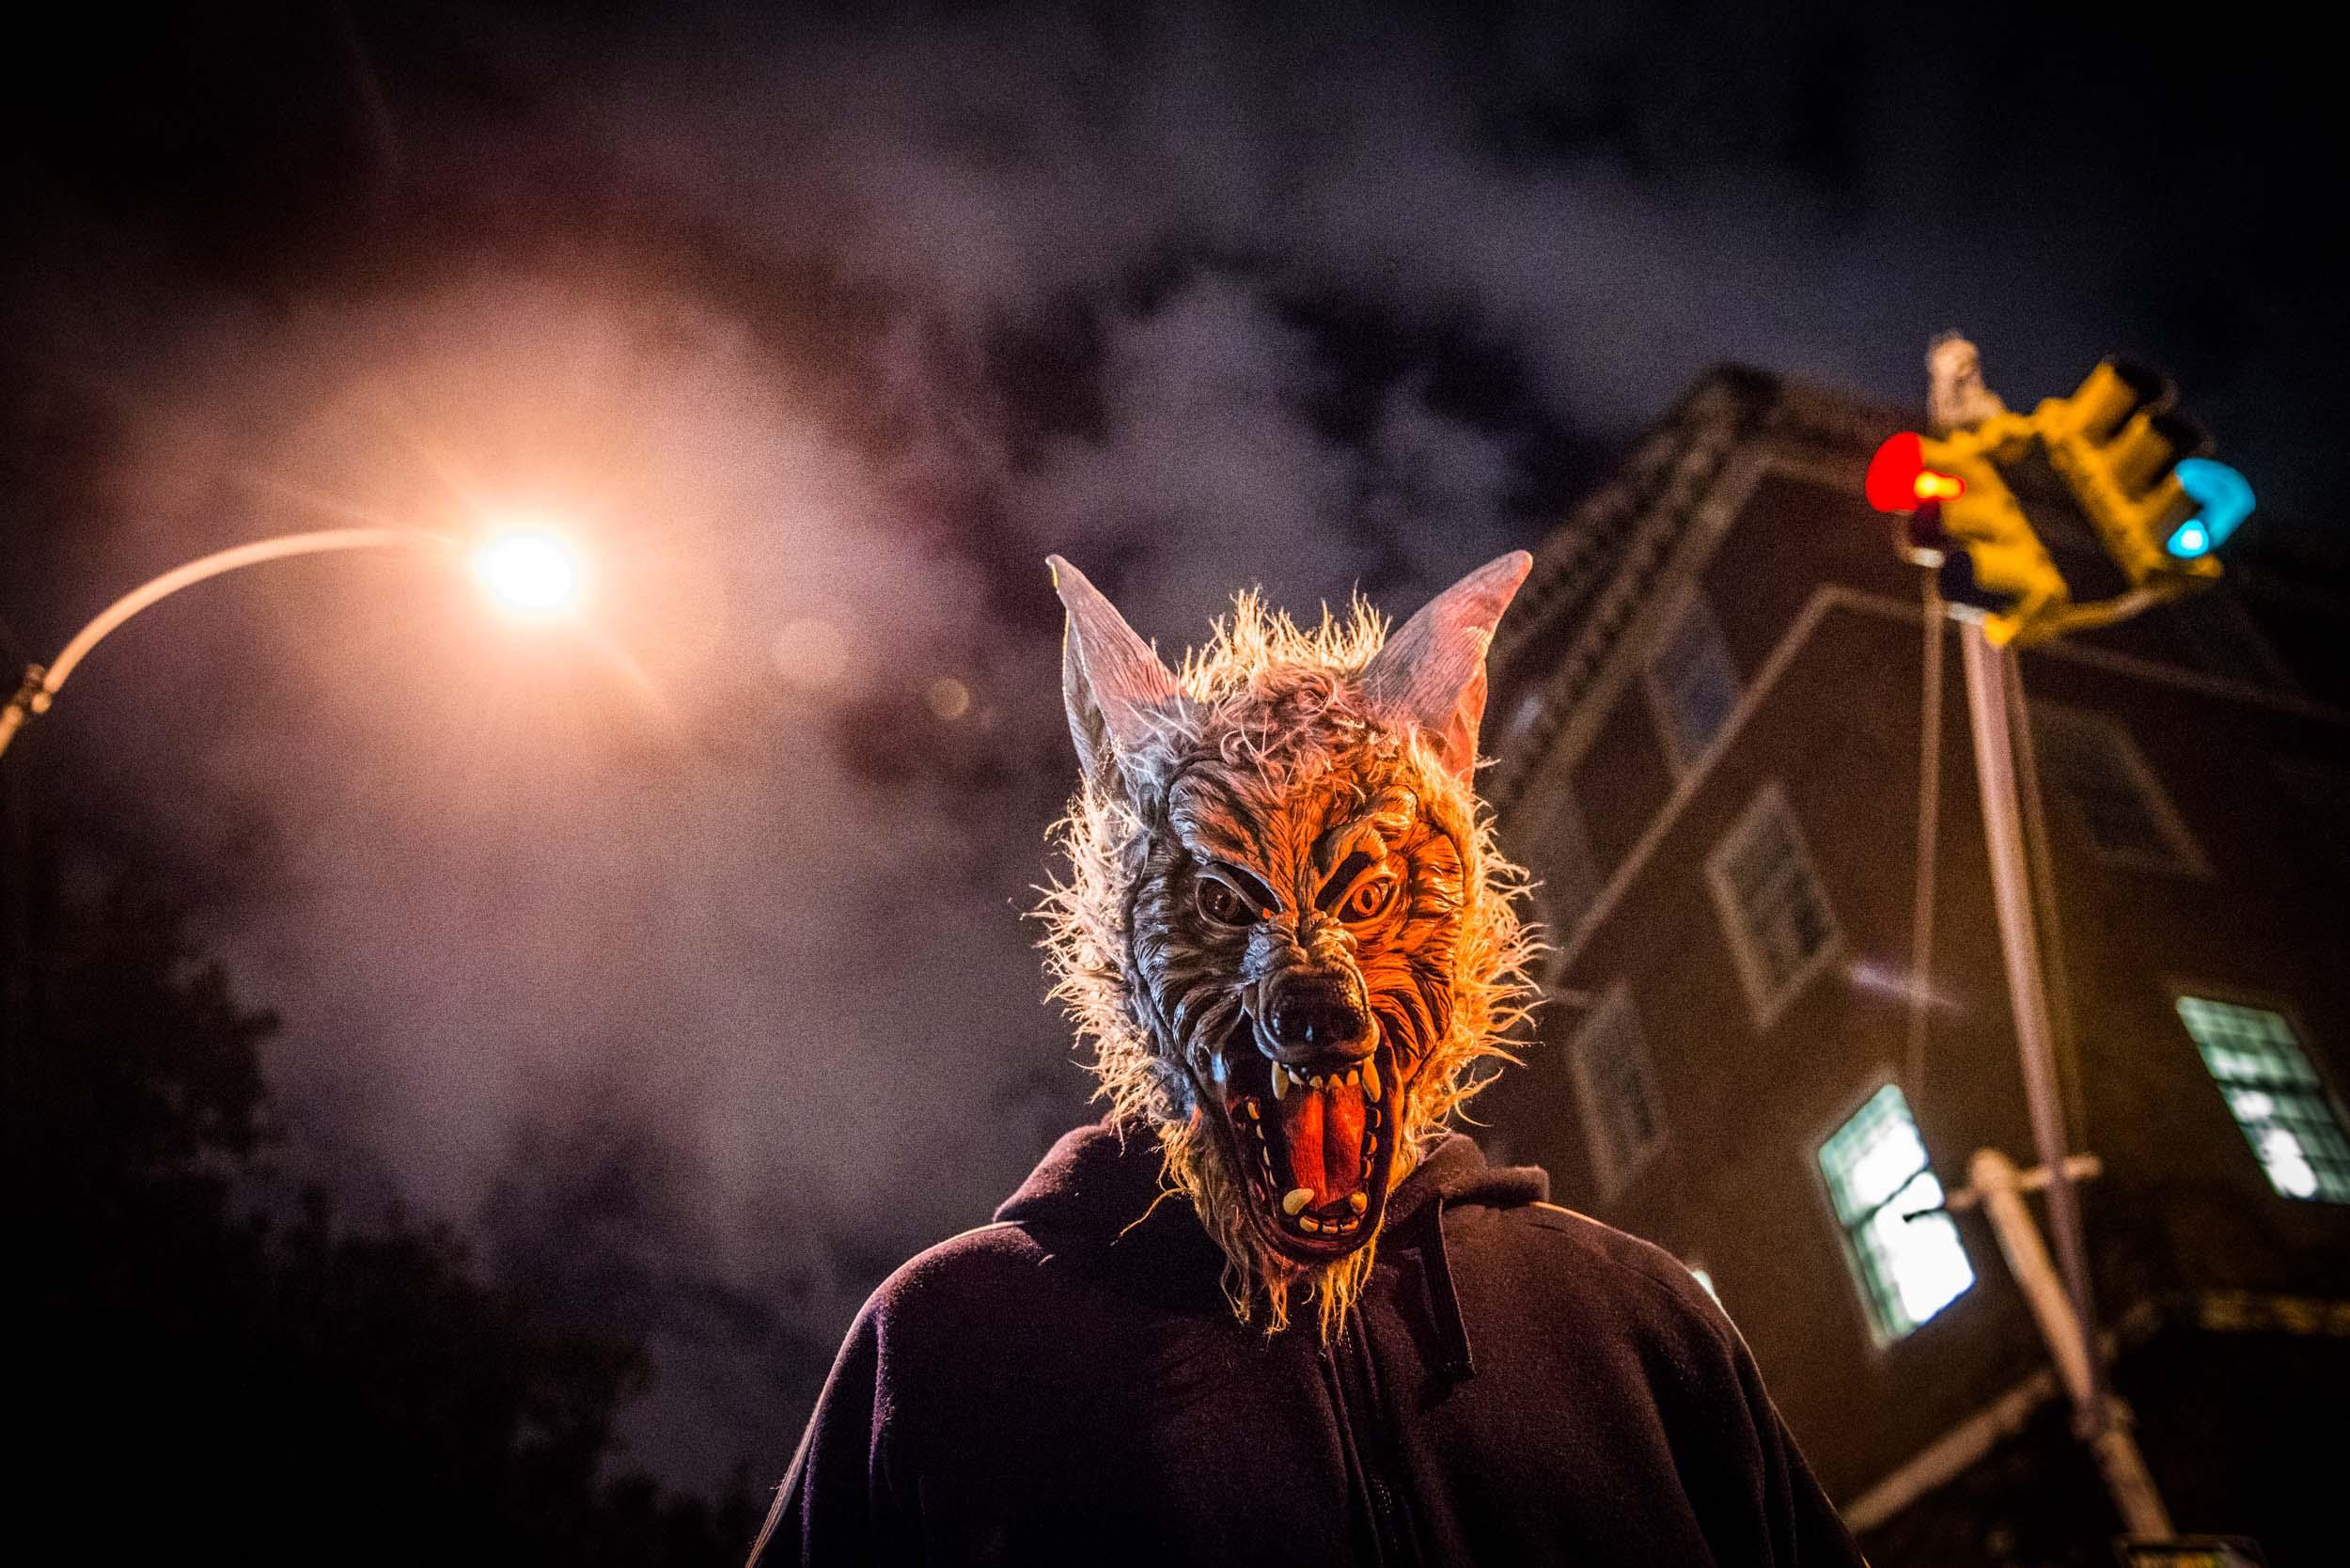 Warewold halloween - Current events - Photo credit Nicola Bailey.jpg